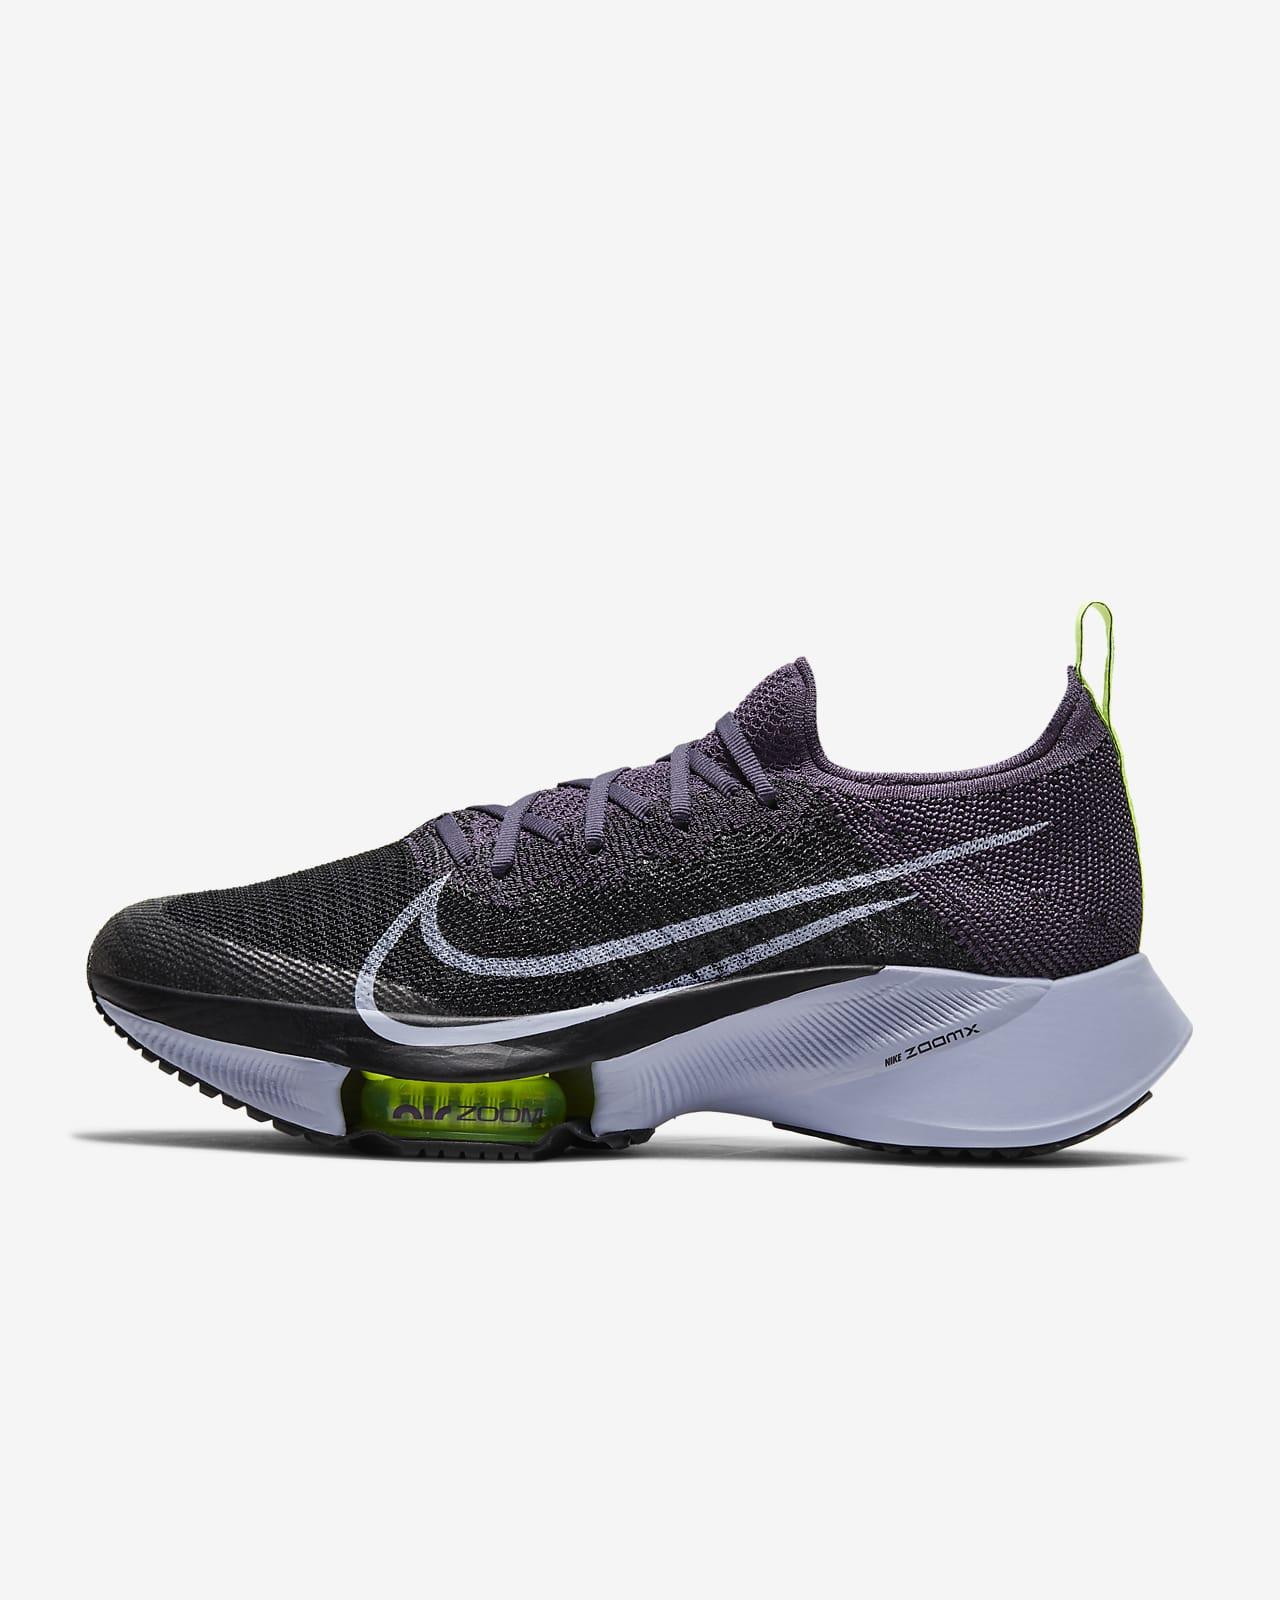 Nike Air Zoom Tempo NEXT% Damen-Straßenlaufschuh